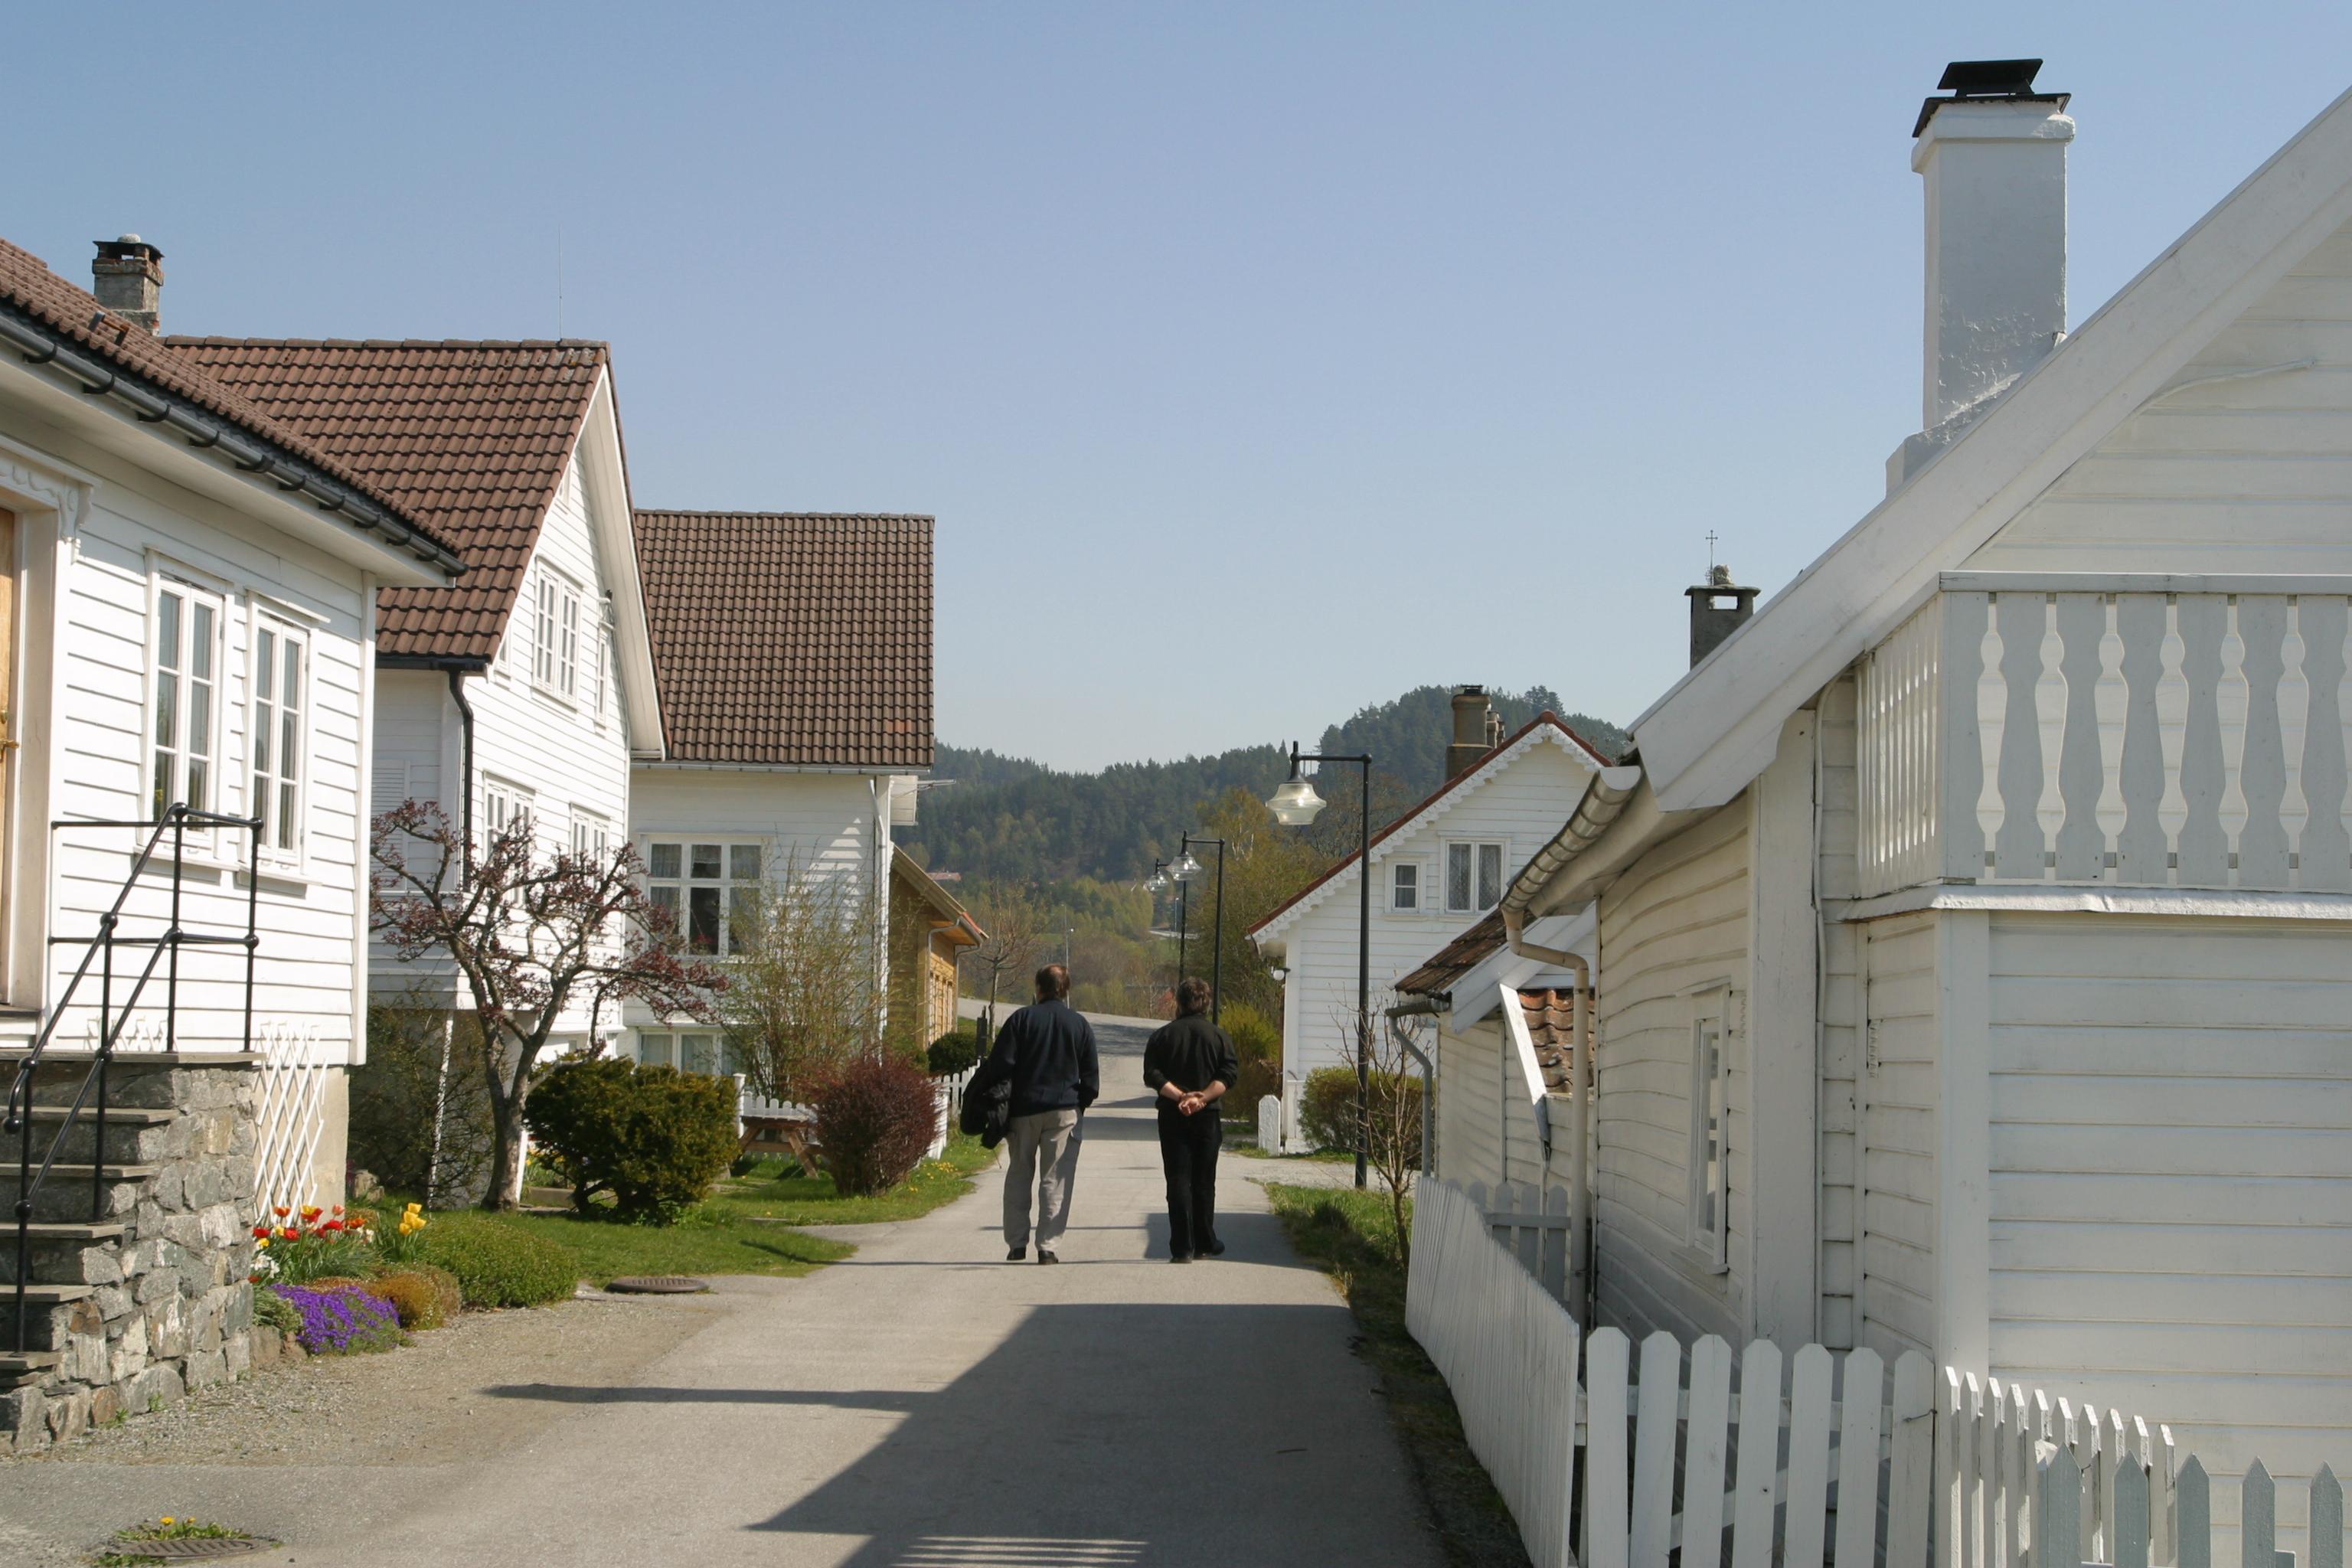 Walk to Barkåsen, Jelsa